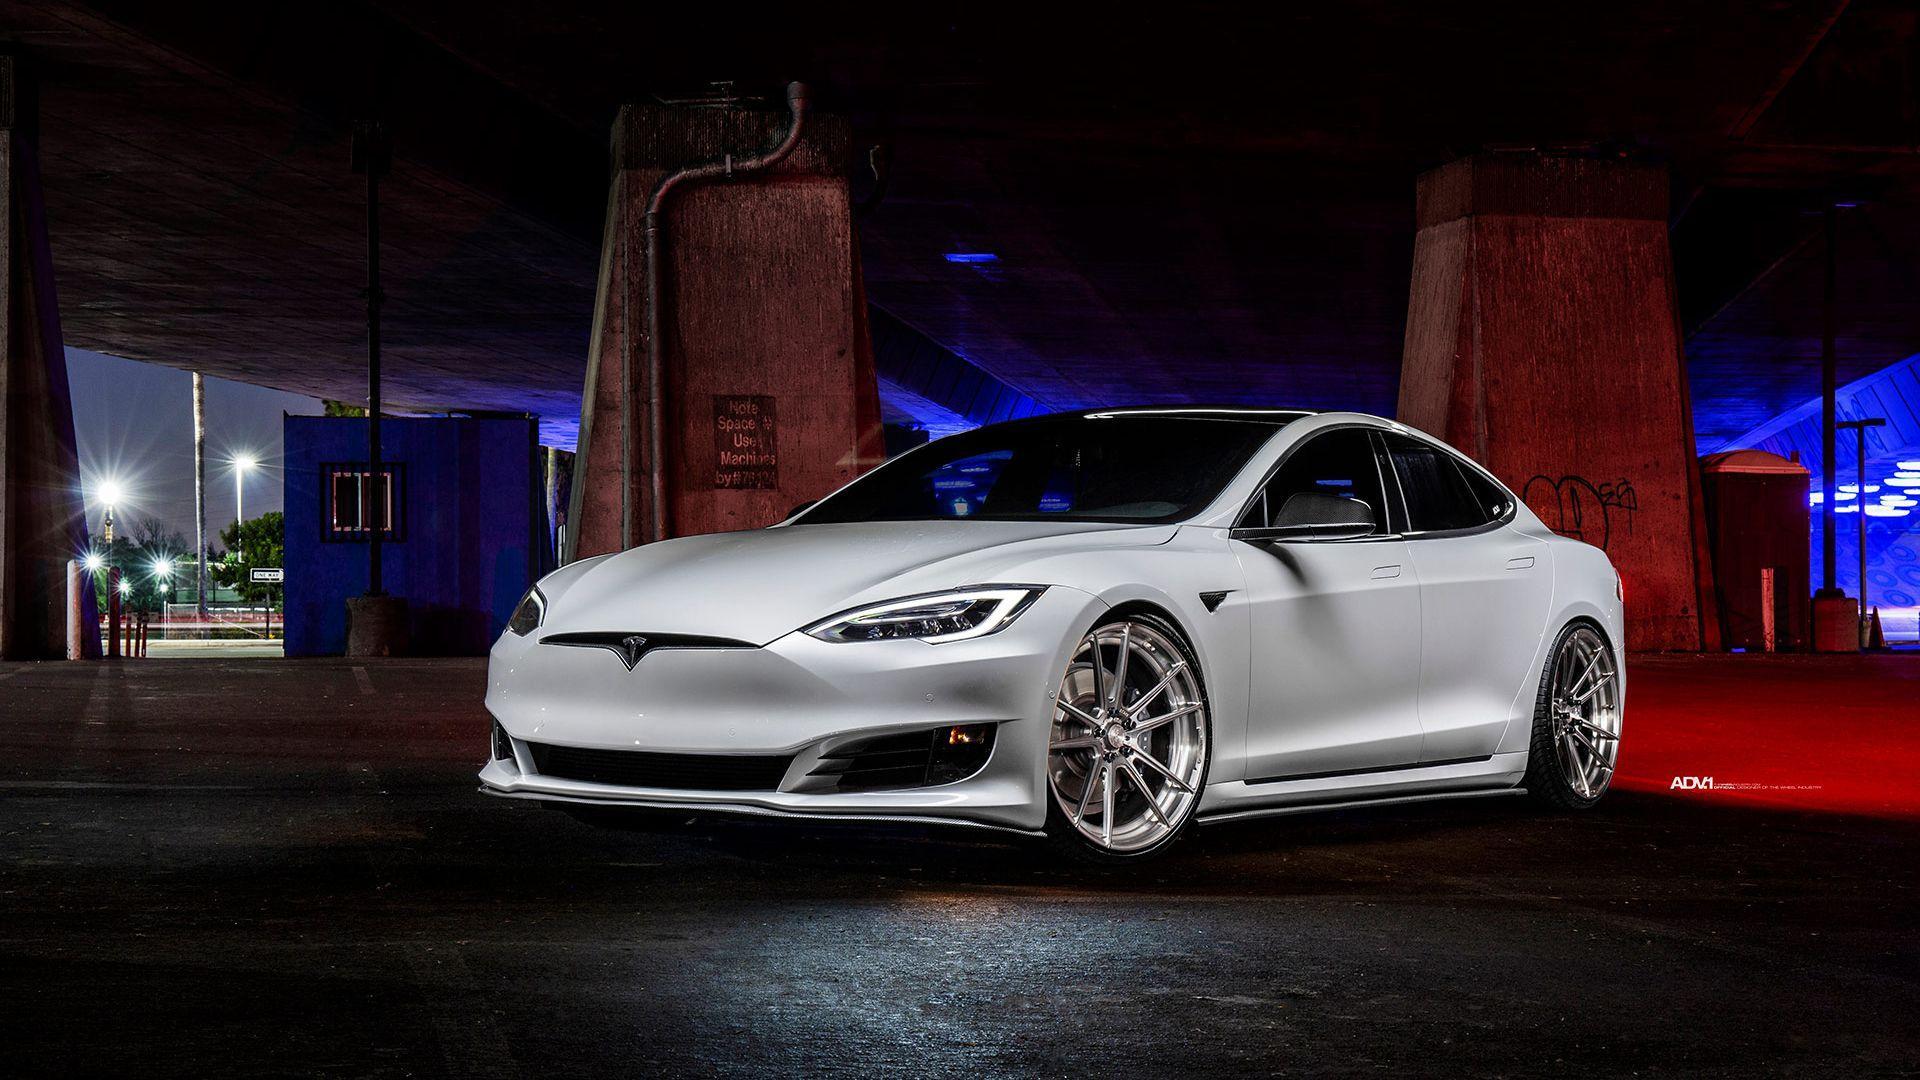 White Tesla Wallpapers Top Free White Tesla Backgrounds Wallpaperaccess